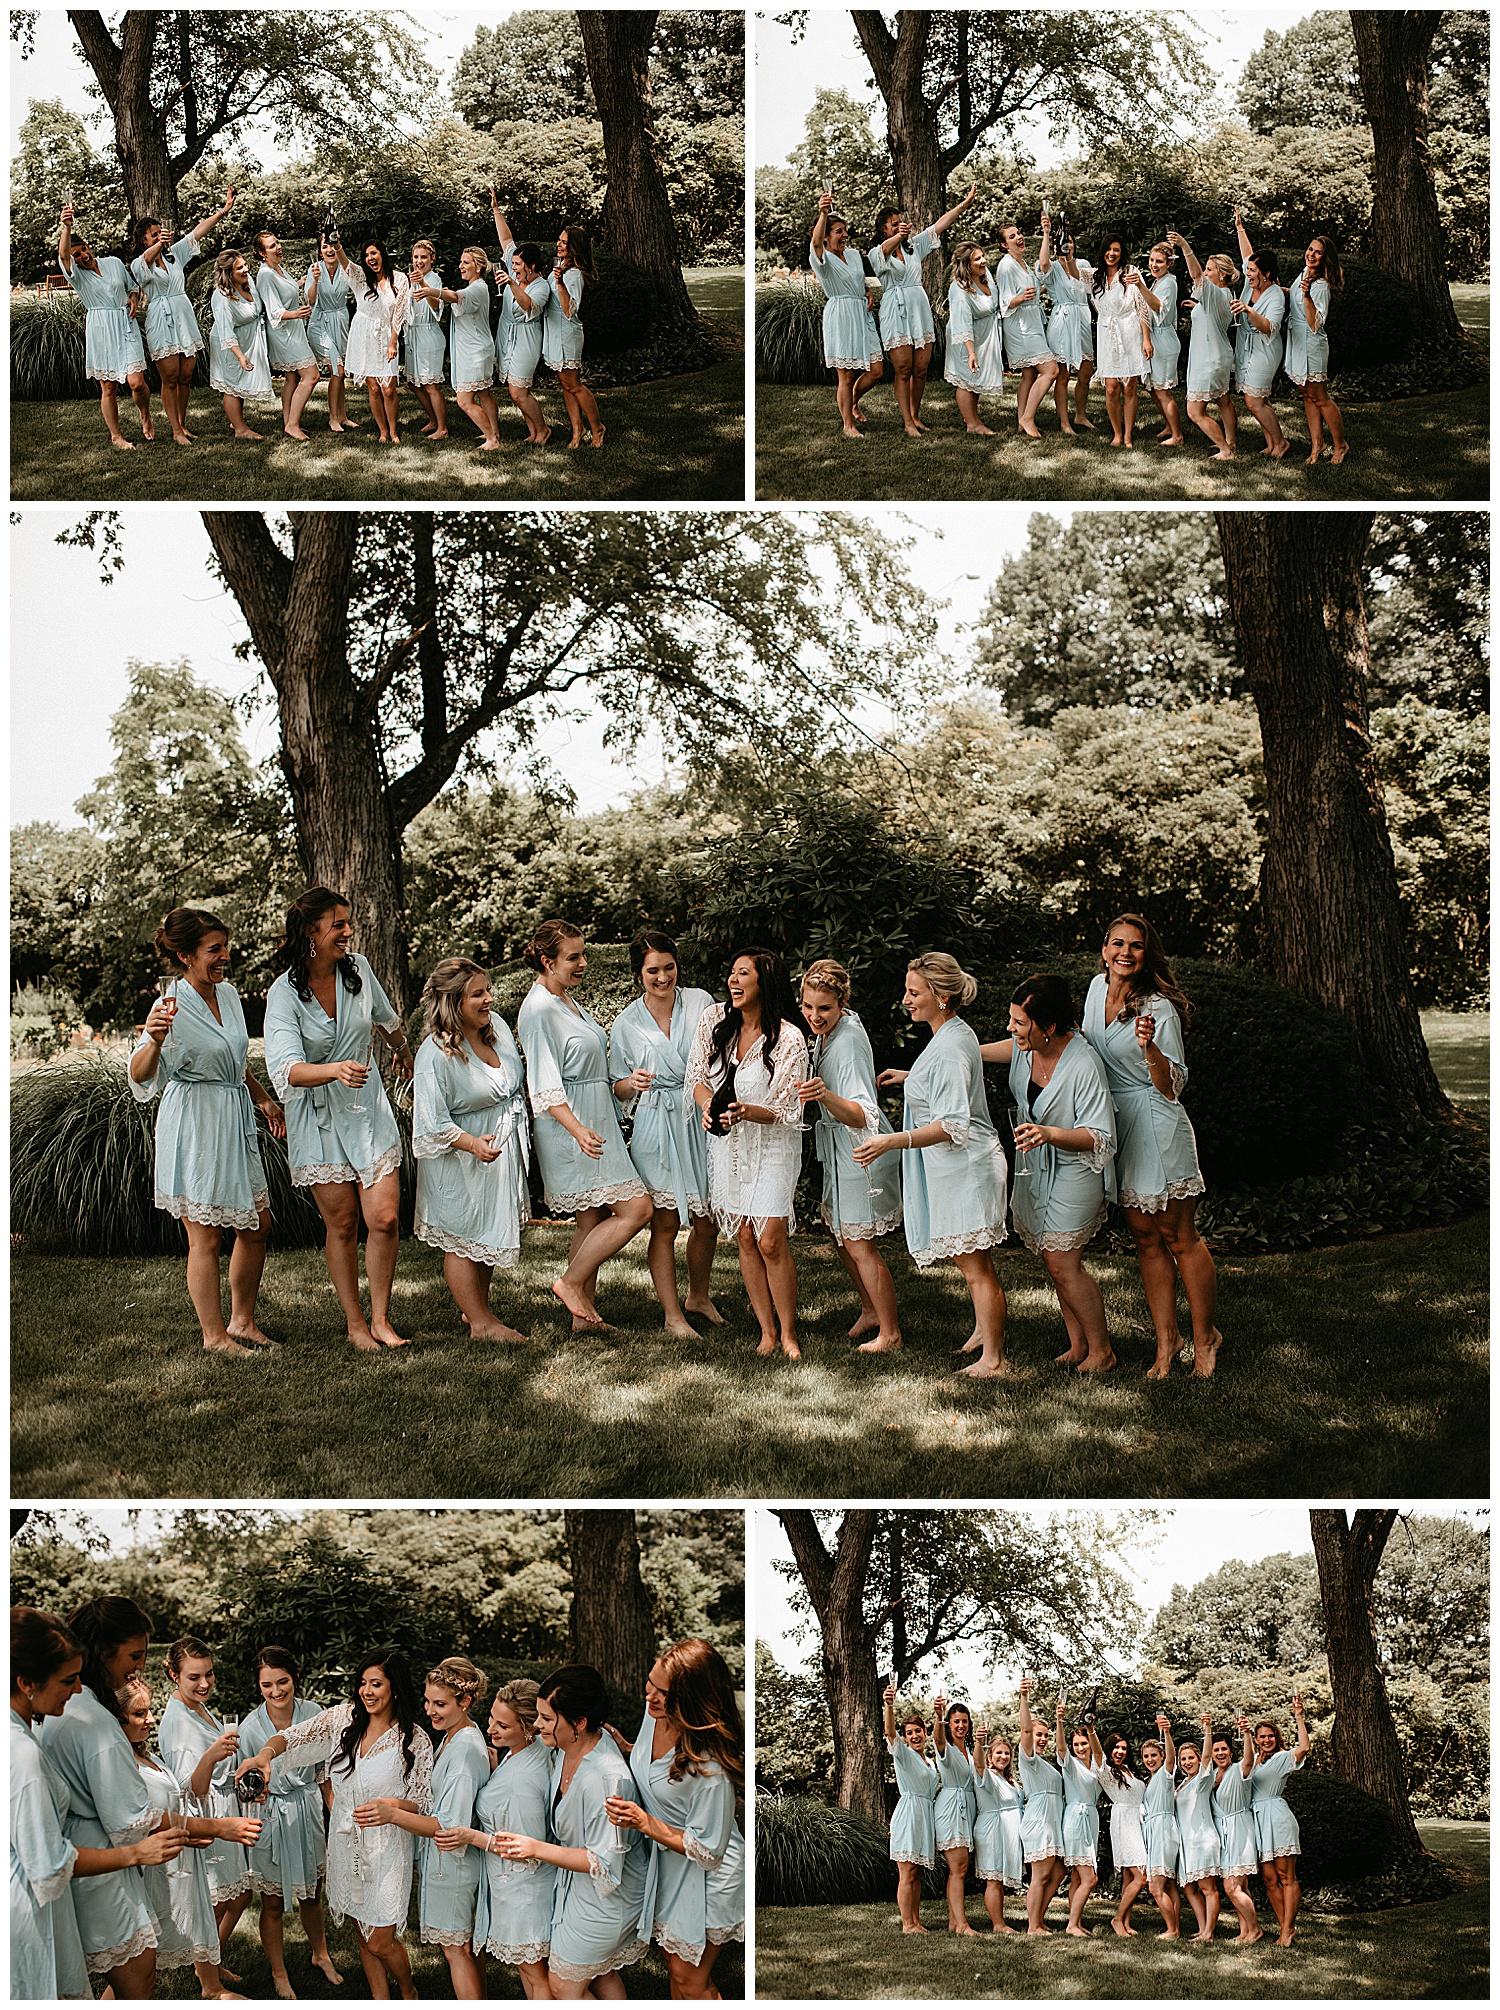 NEPA-Bloomsburg-Wedding-Photographer-at-The-Barn-at-Boones-Dam-Bloomsburg-PA_0011.jpg